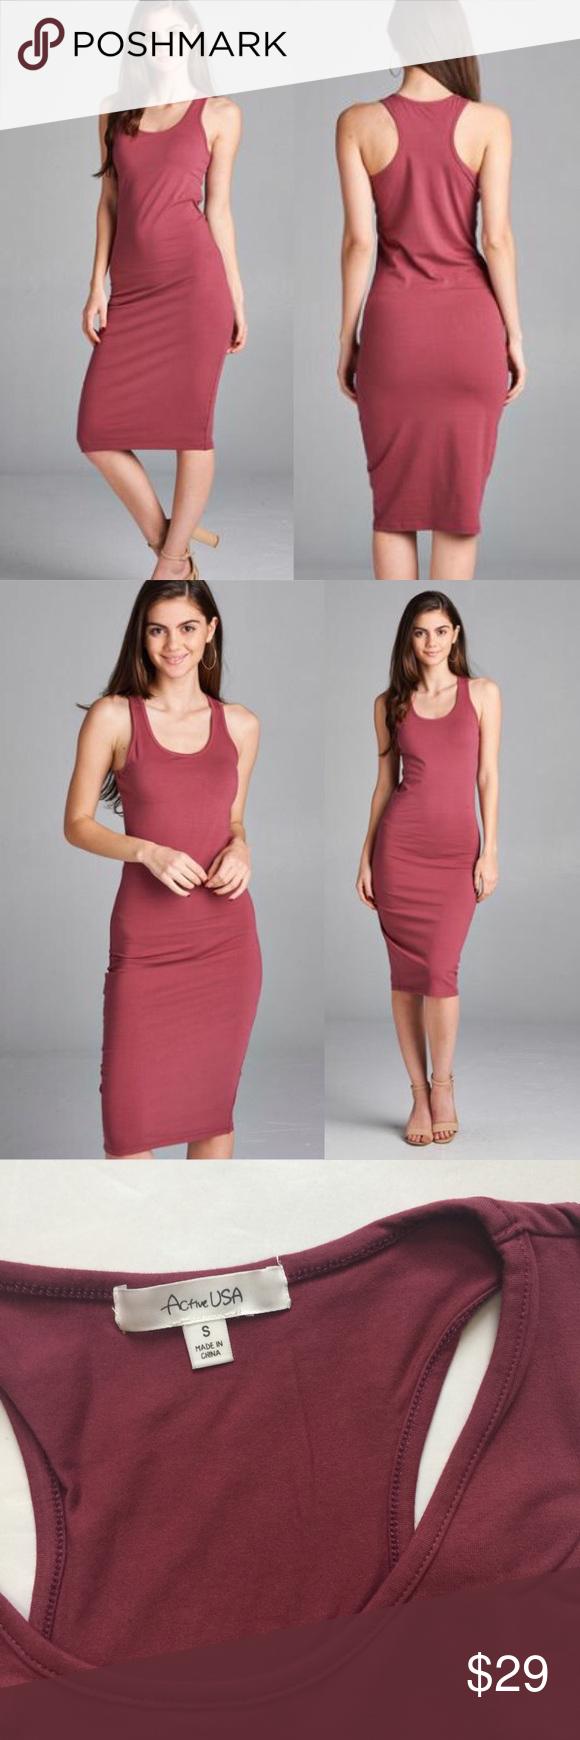 Small Racerback Bodycon Dress Mauve Bodycon Dress Knit Midi Dress Dresses [ 1740 x 580 Pixel ]